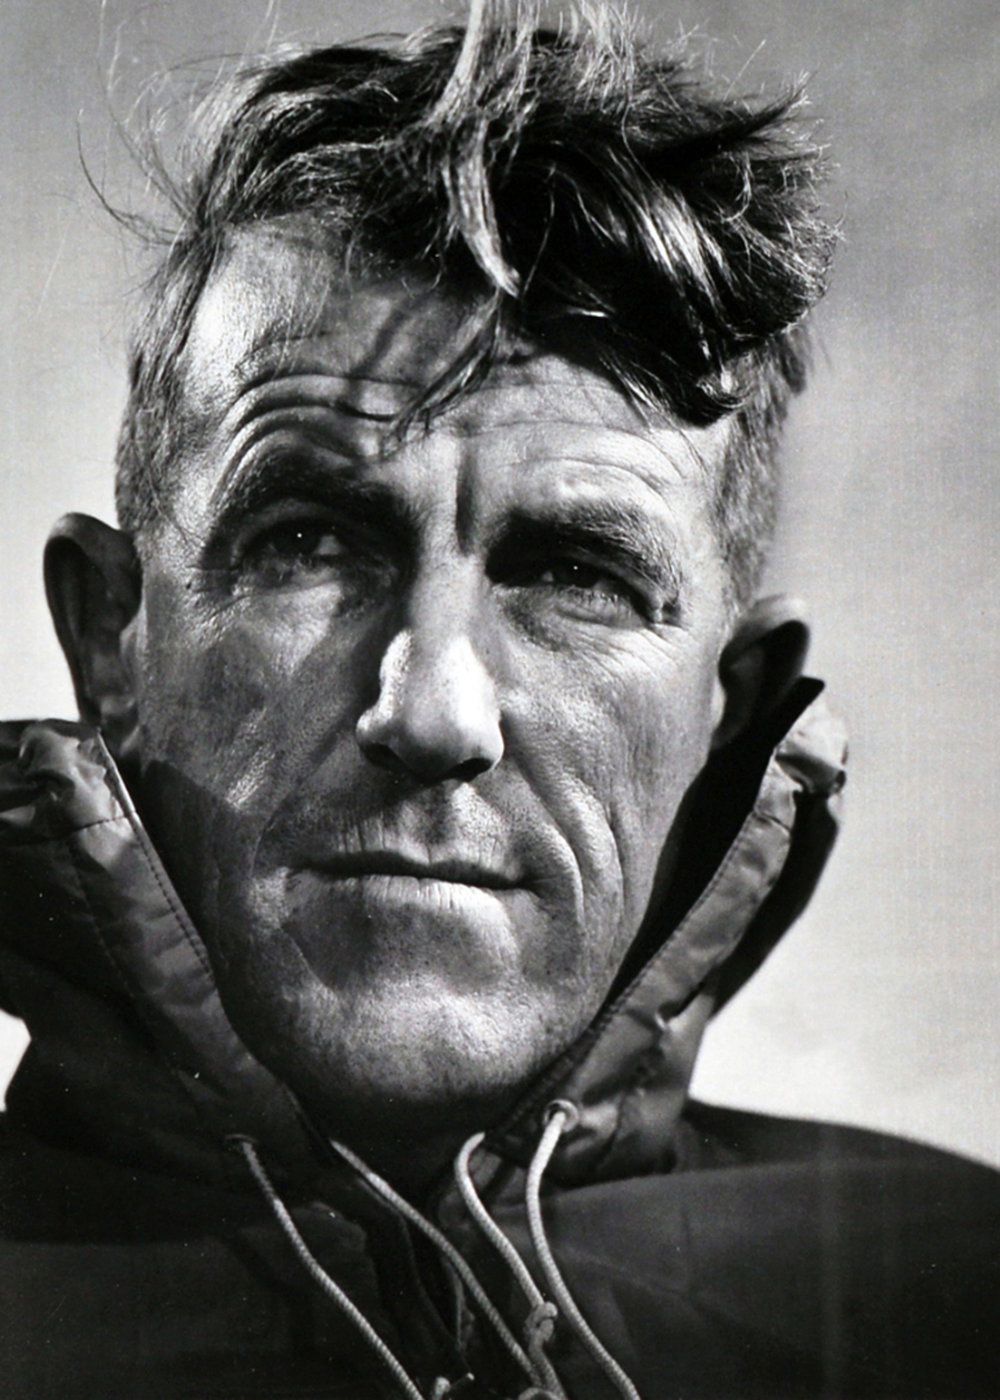 Edmund Hillary - Climber